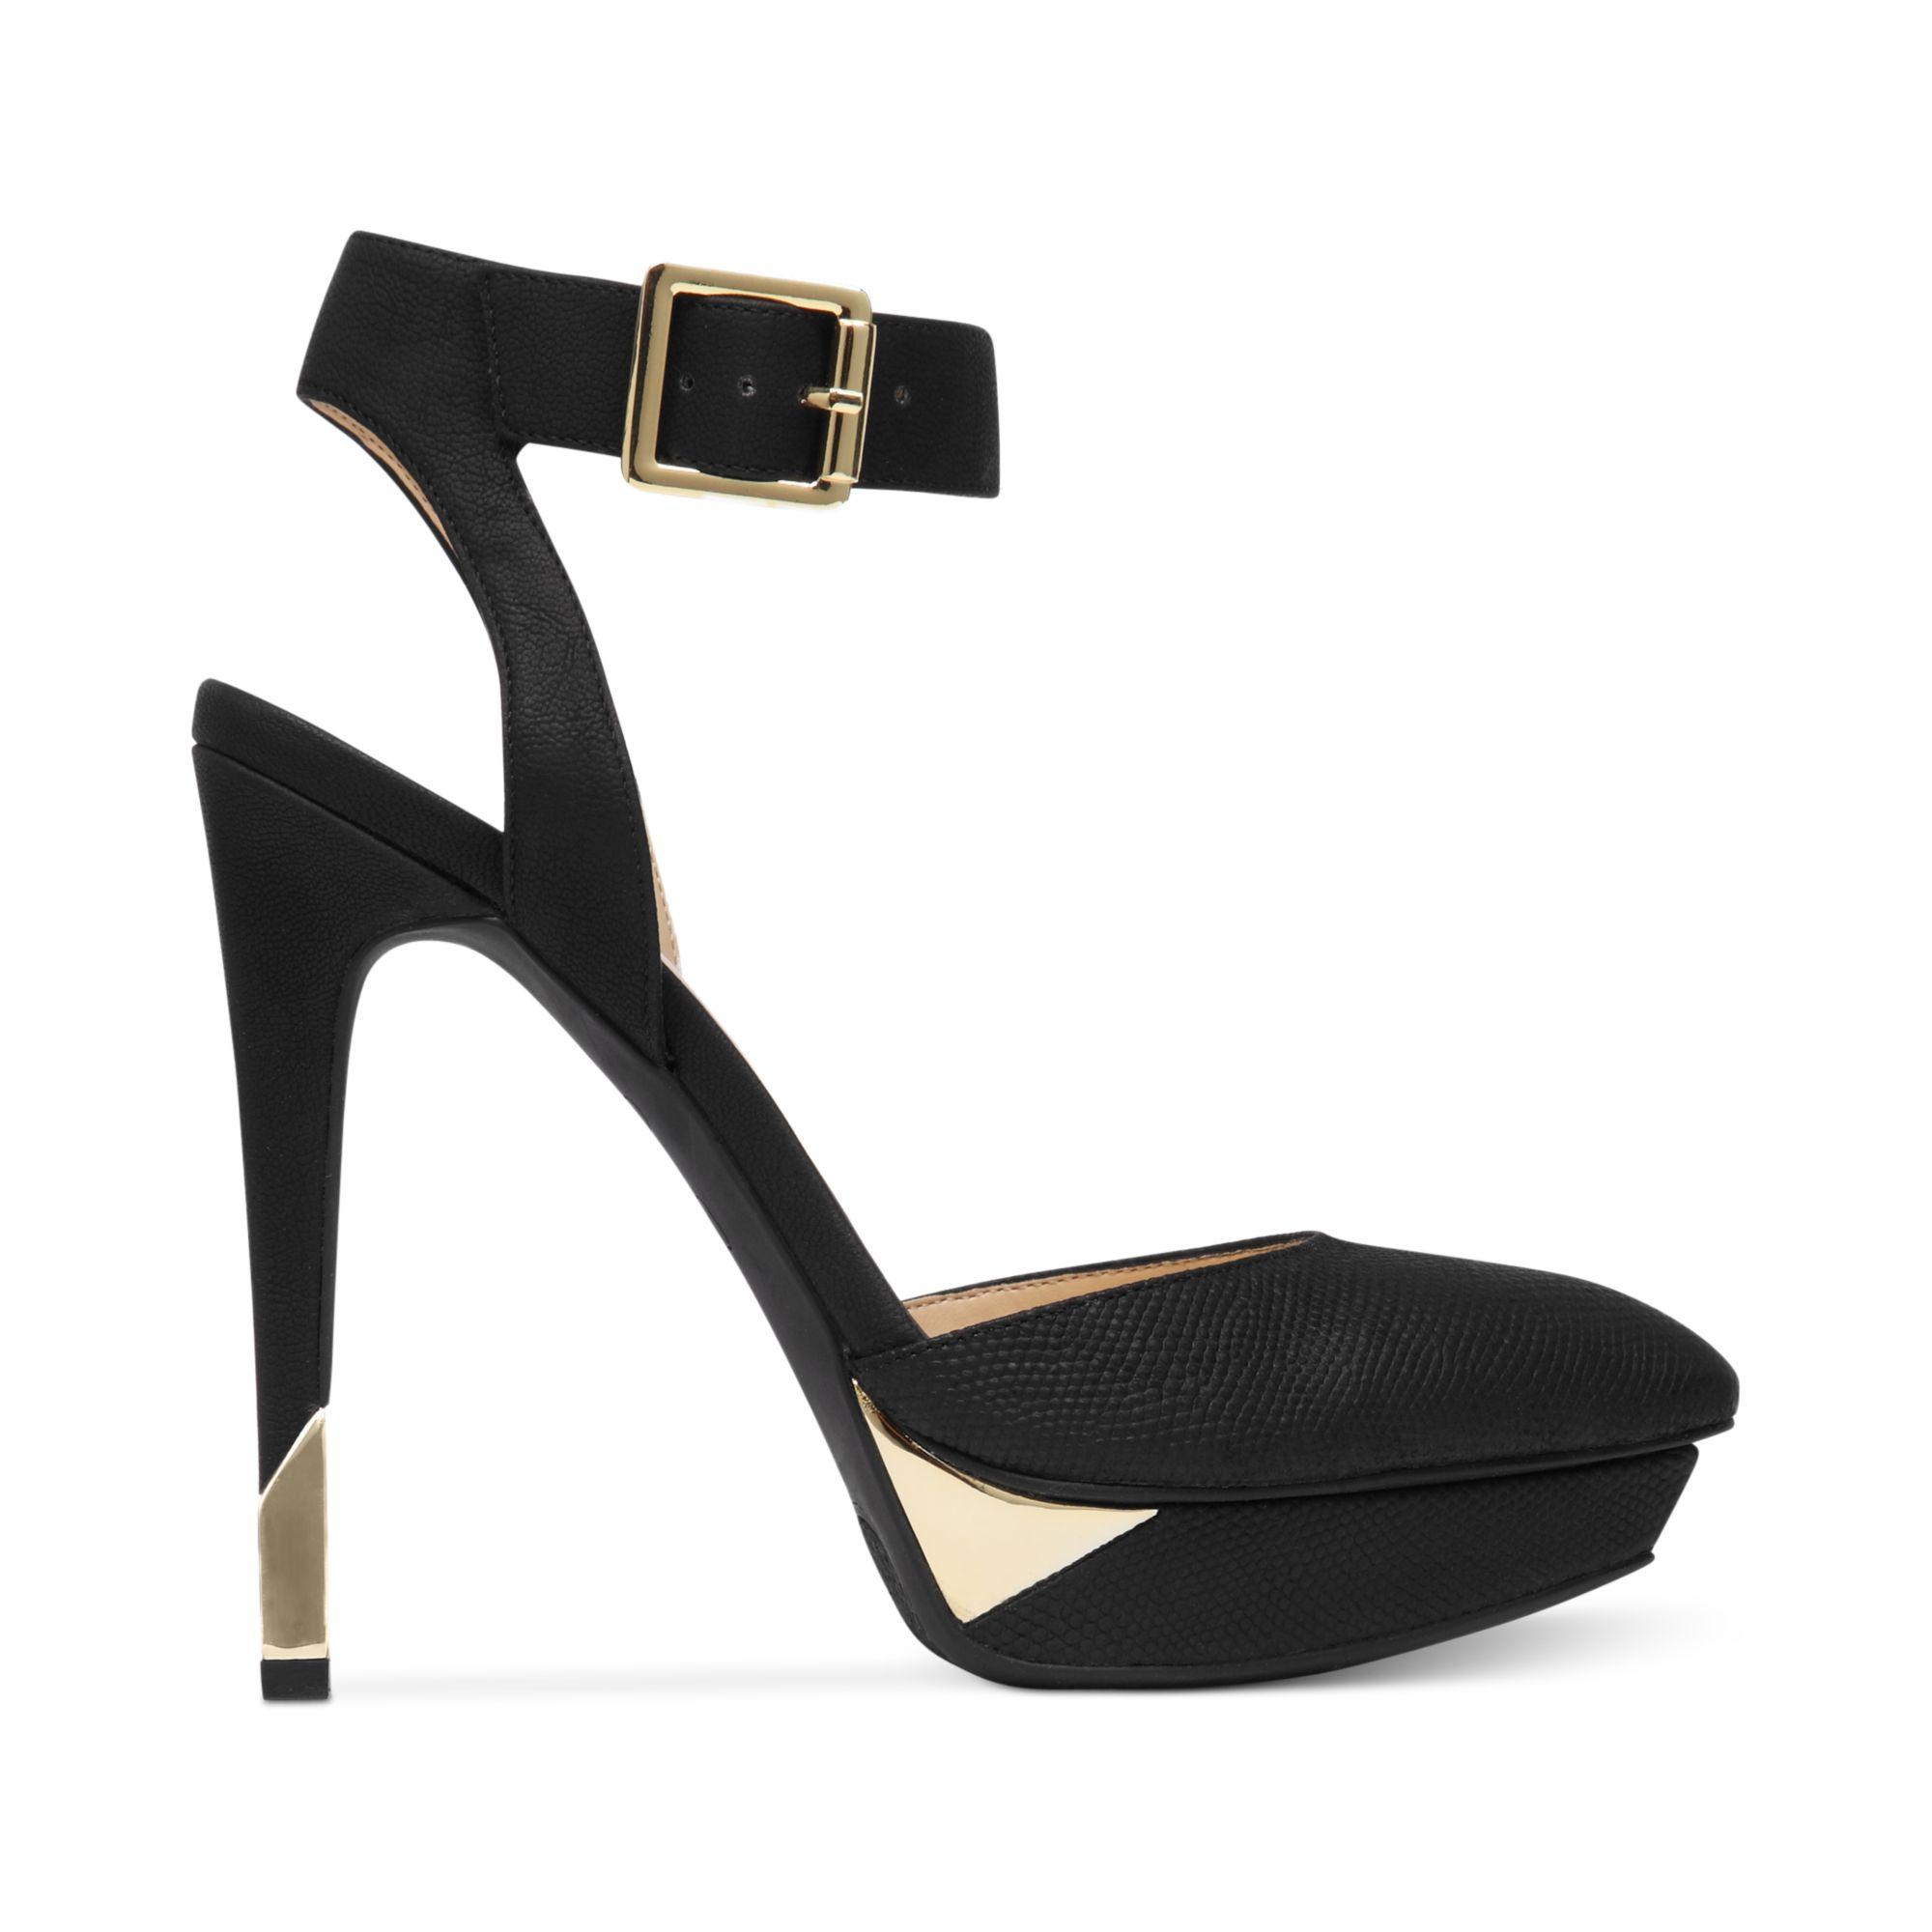 Jessica simpson Valleyy Ankle Strap Platform Pumps in Black | Lyst